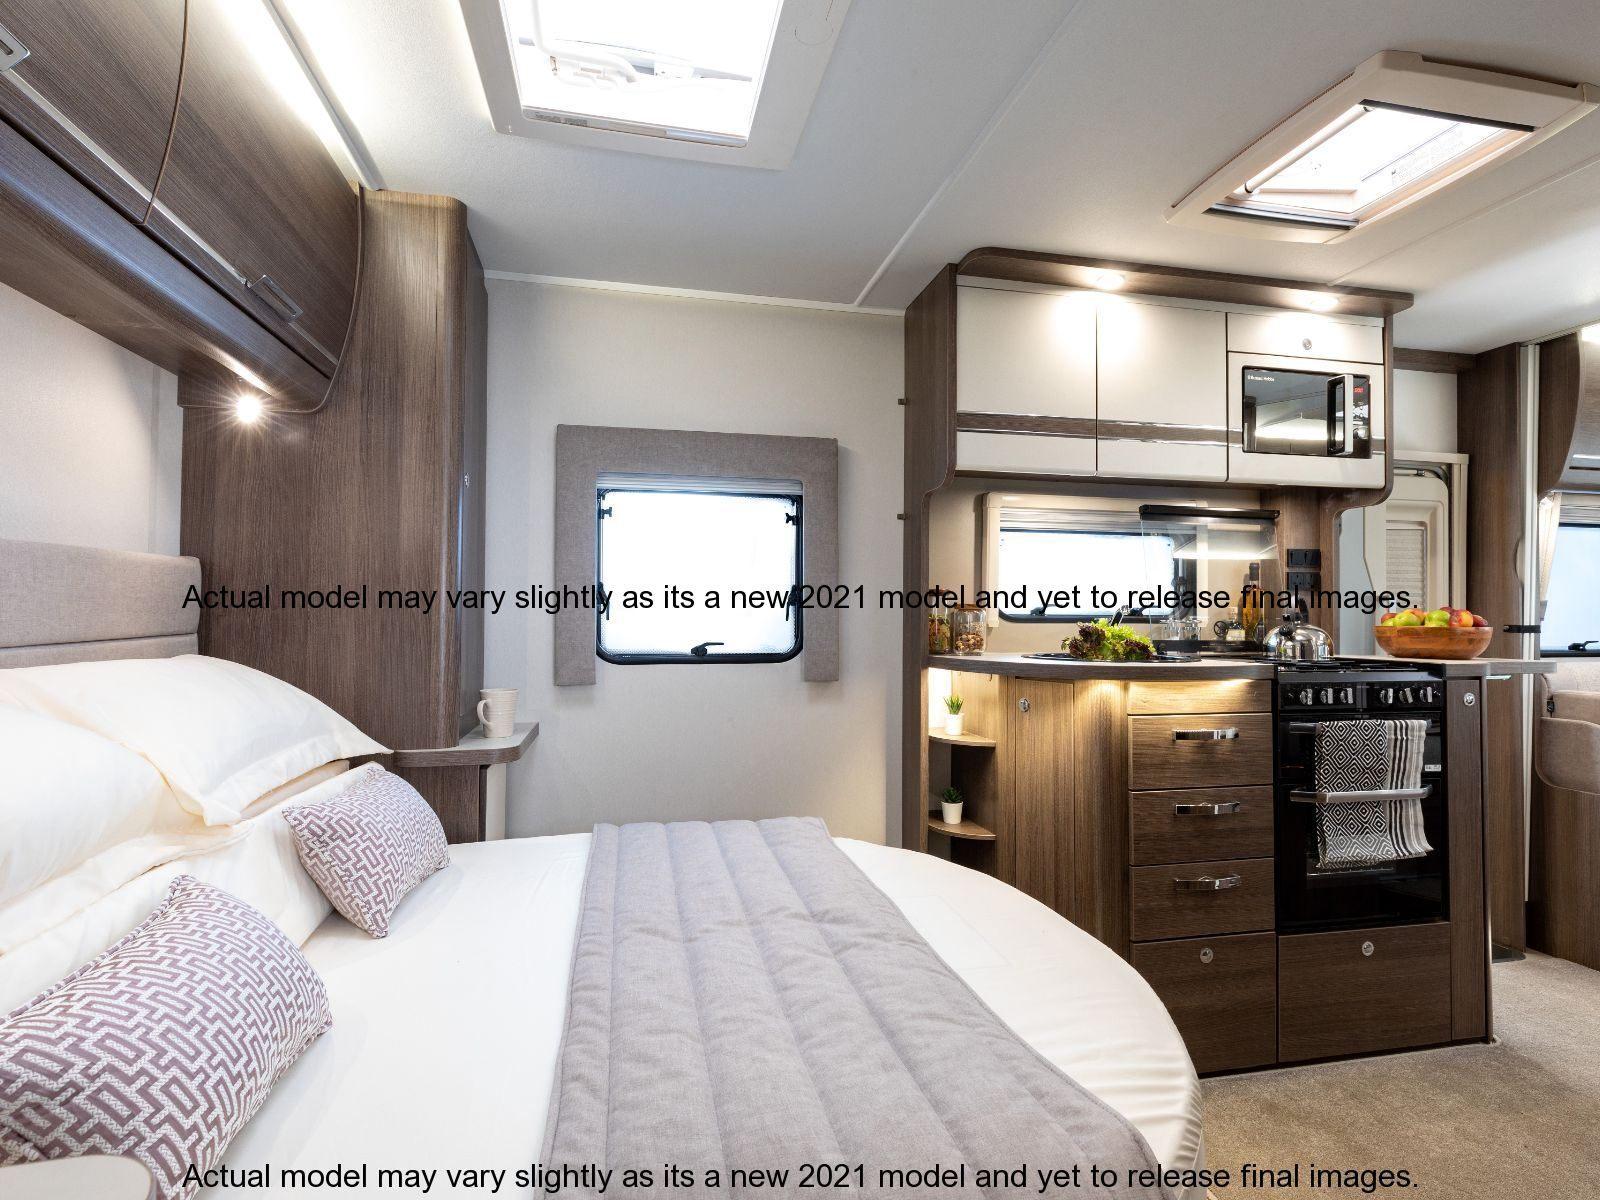 Elddis_150_Venture_Motorhome_interior8